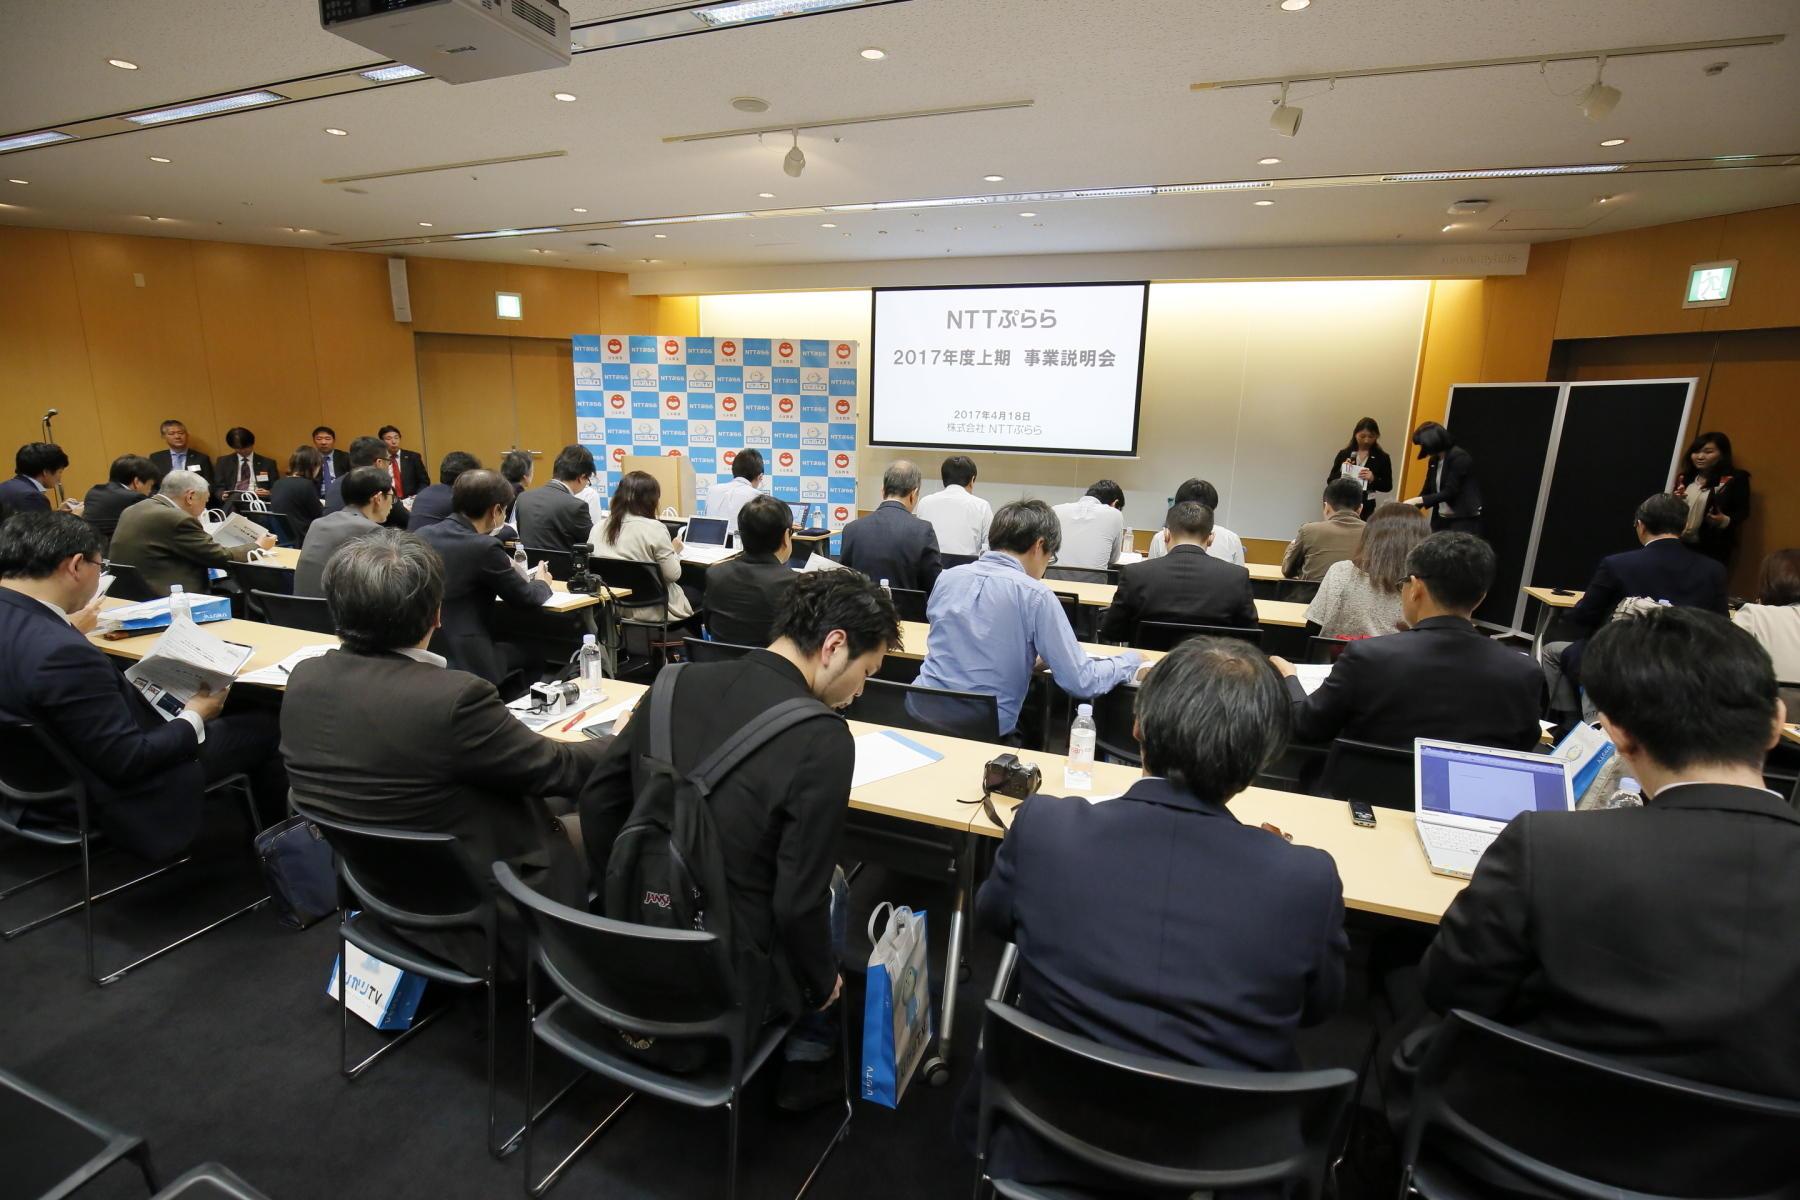 http://news.yoshimoto.co.jp/20170420225414-49005ef797c6e2c2f5d93791d1559f761251e087.jpg